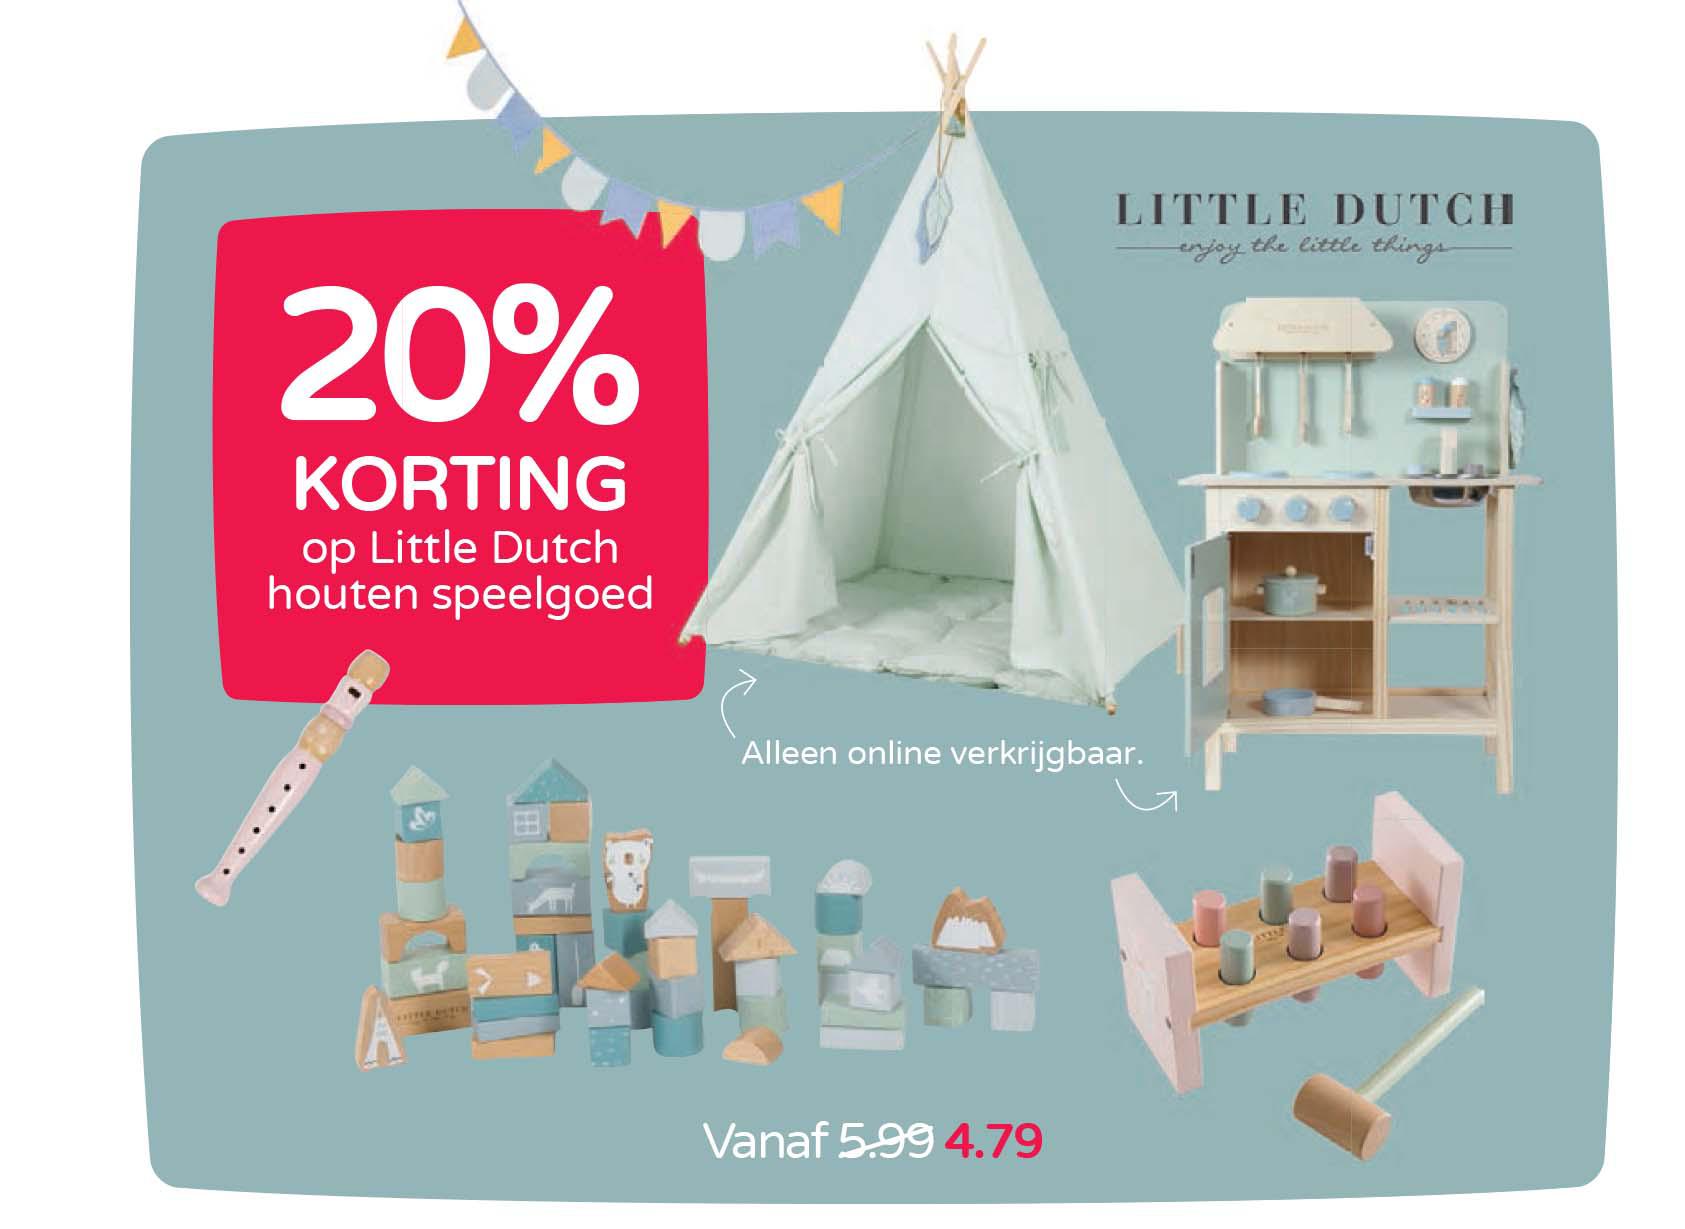 Prénatal 20% Korting Op Little Dutch Houten Speelgoed